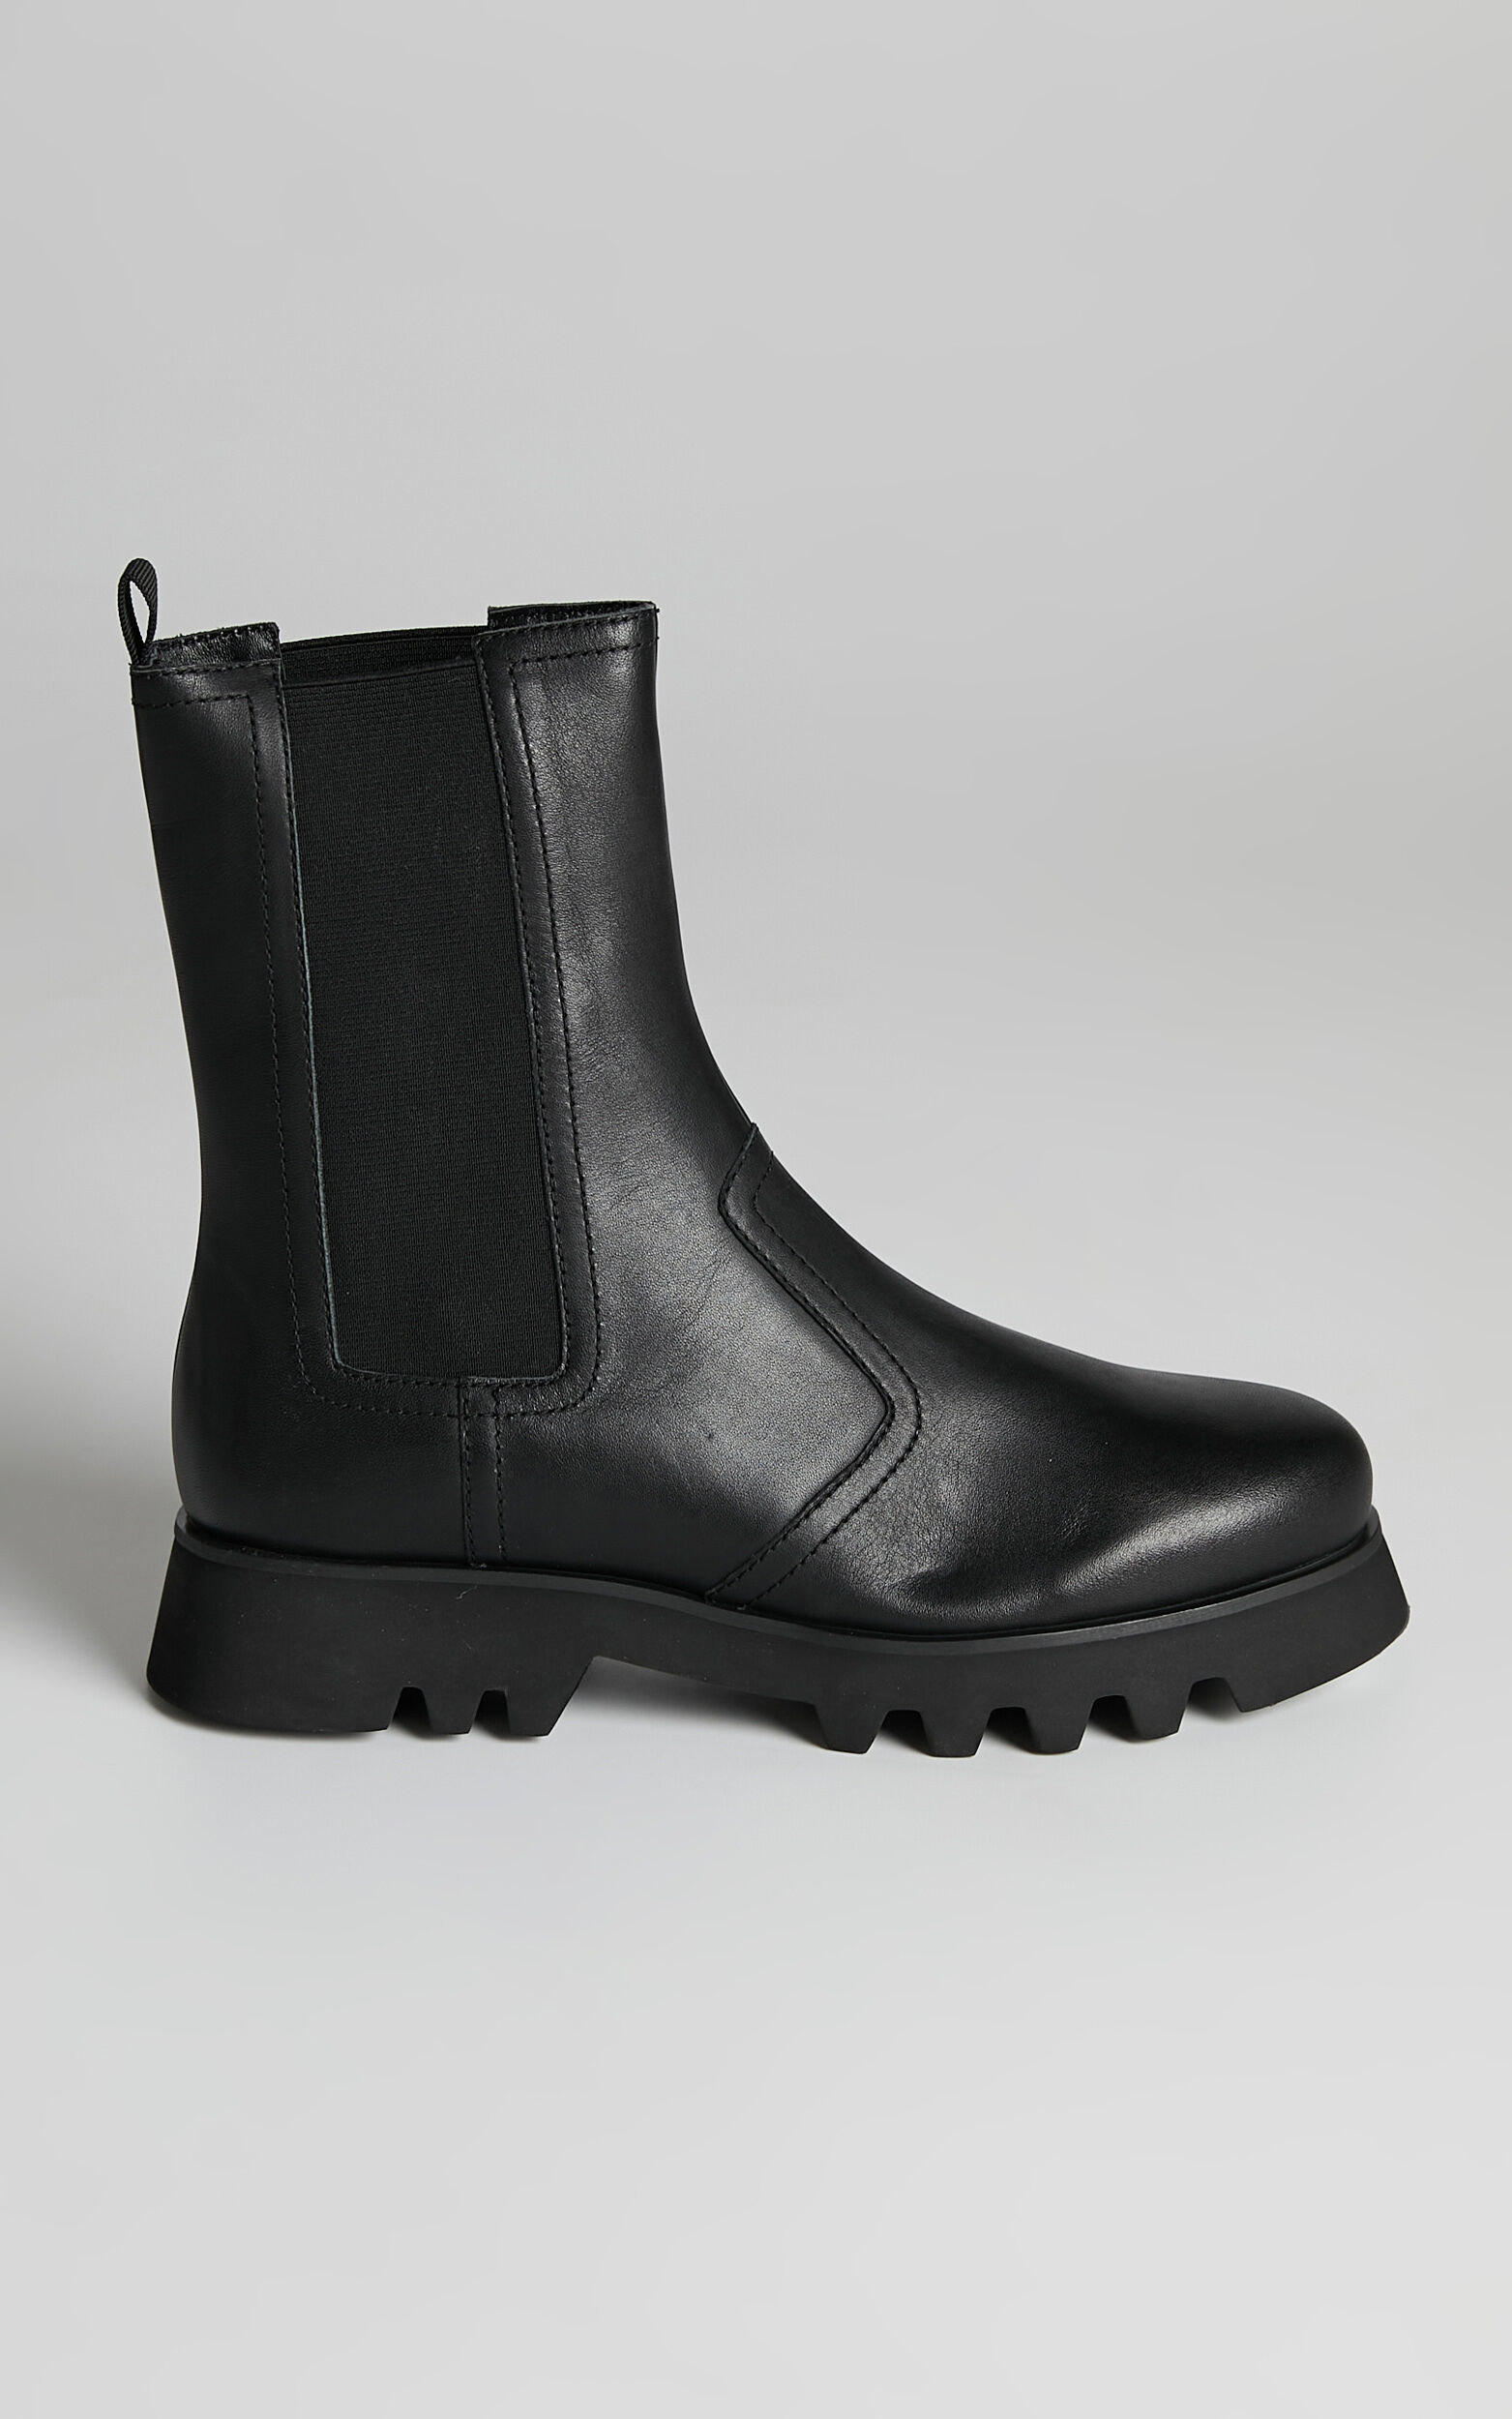 Tony Bianco - Izzy Boots in Black Como - 06, BLK1, super-hi-res image number null